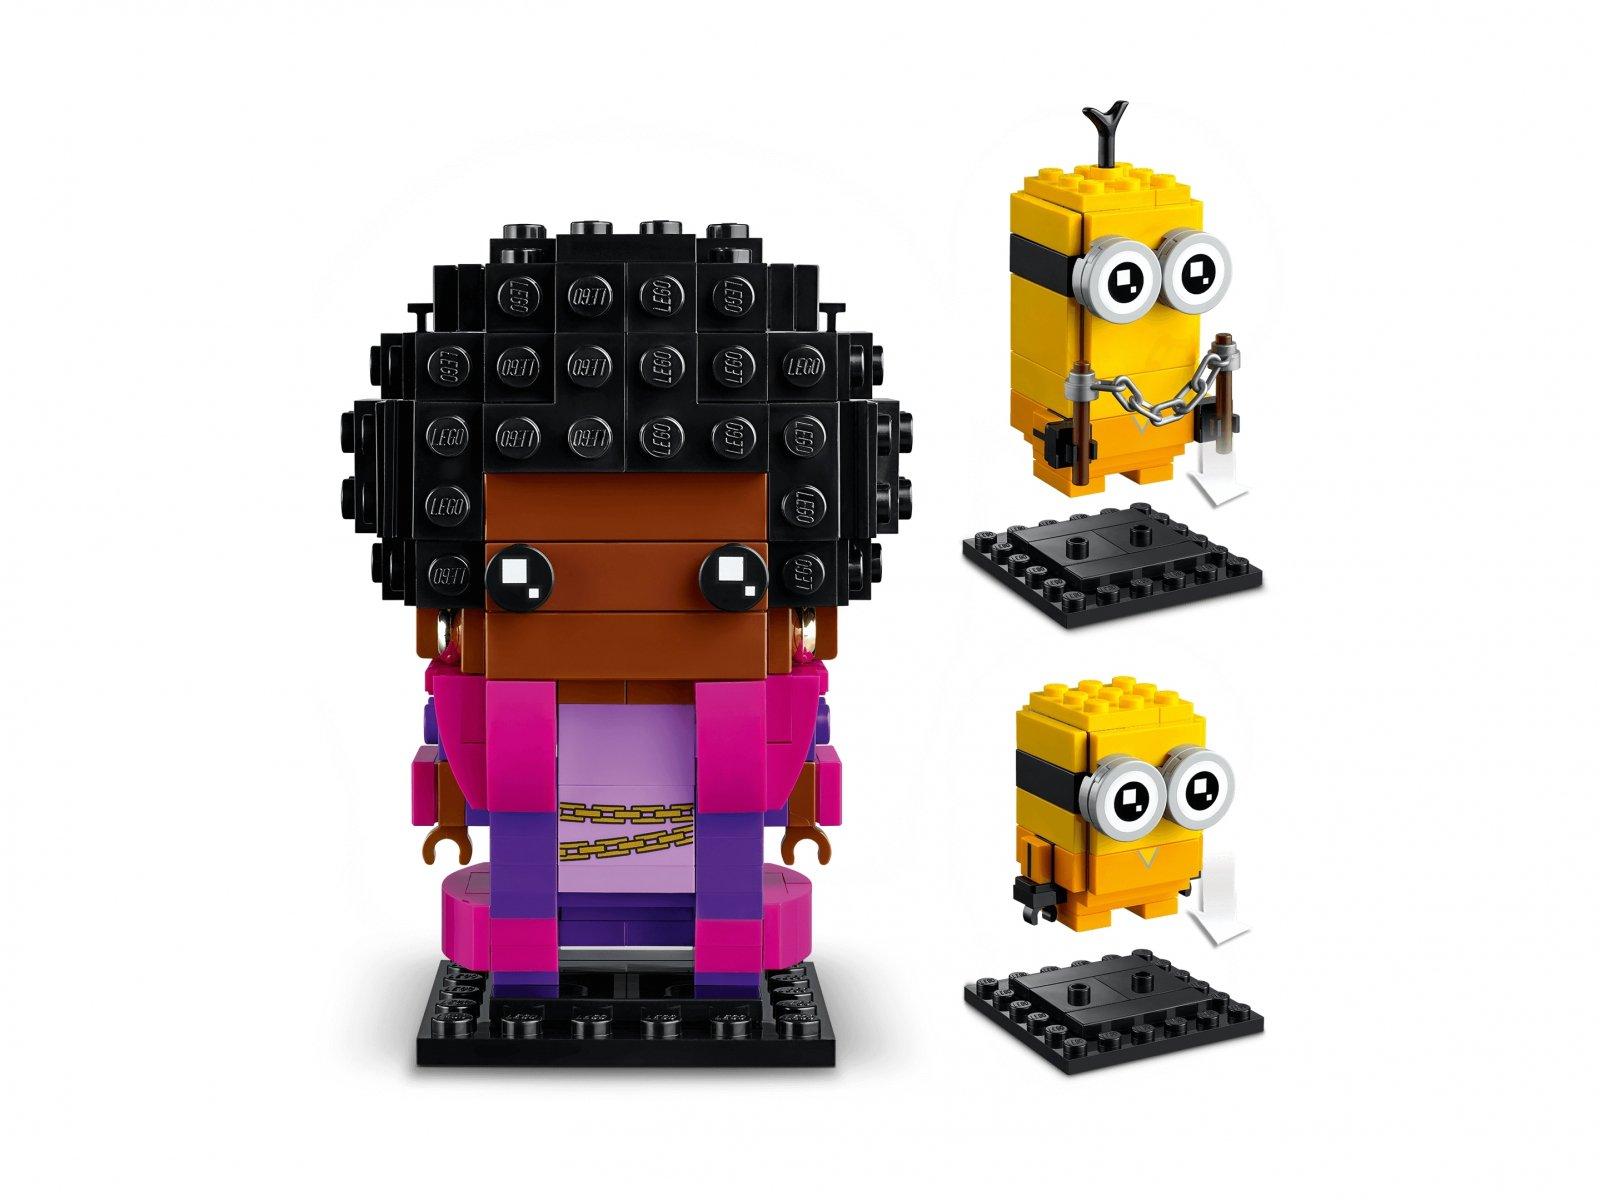 LEGO BrickHeadz 40421 Belle Bottom, Kevin i Bob